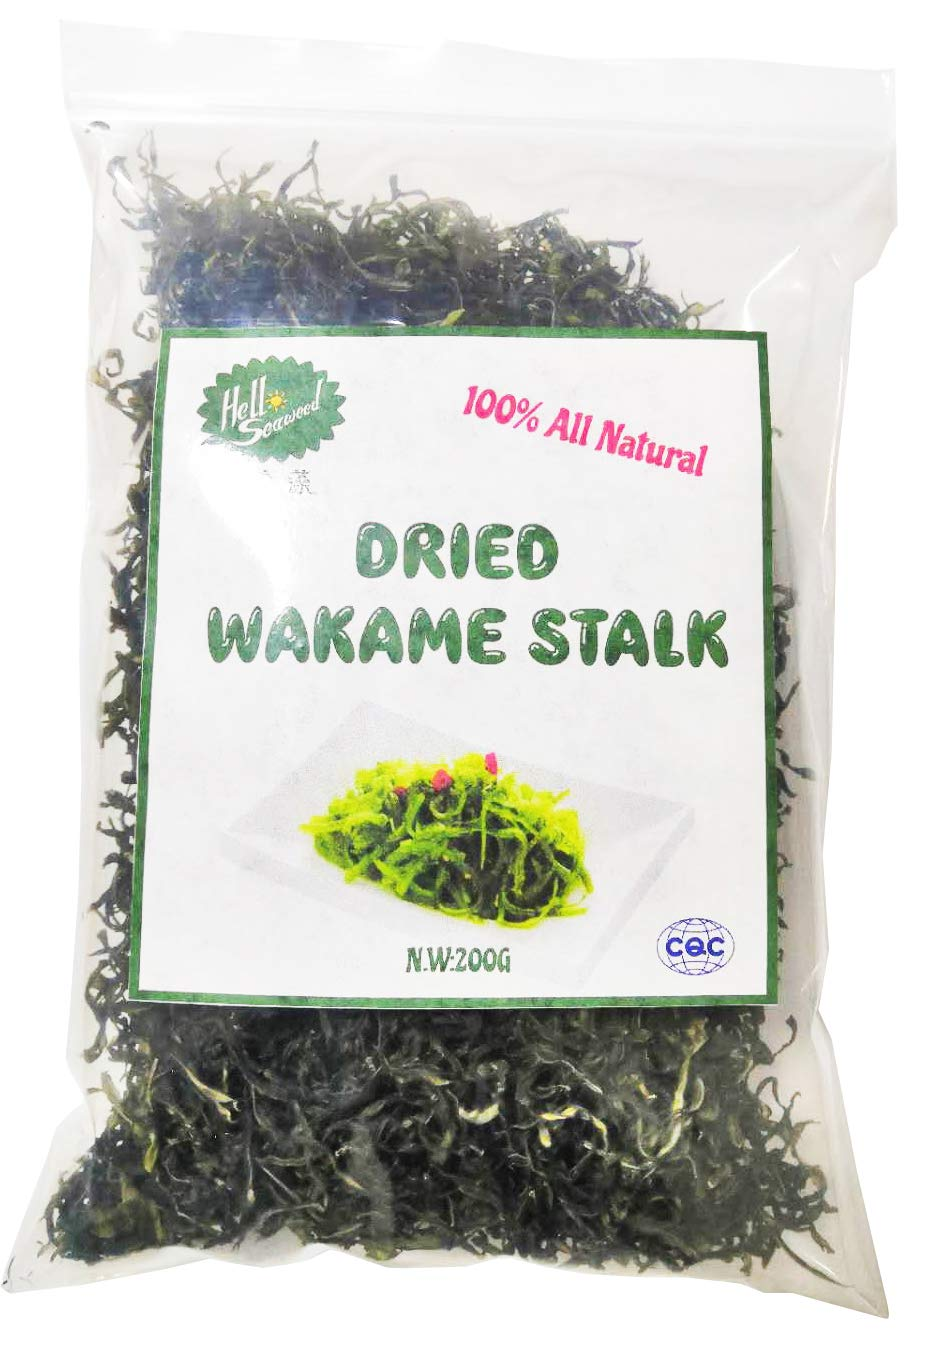 Dried Wakame Strips Stalk Food 200g (pack of 7) by Fuzhou Wonderful (Image #1)